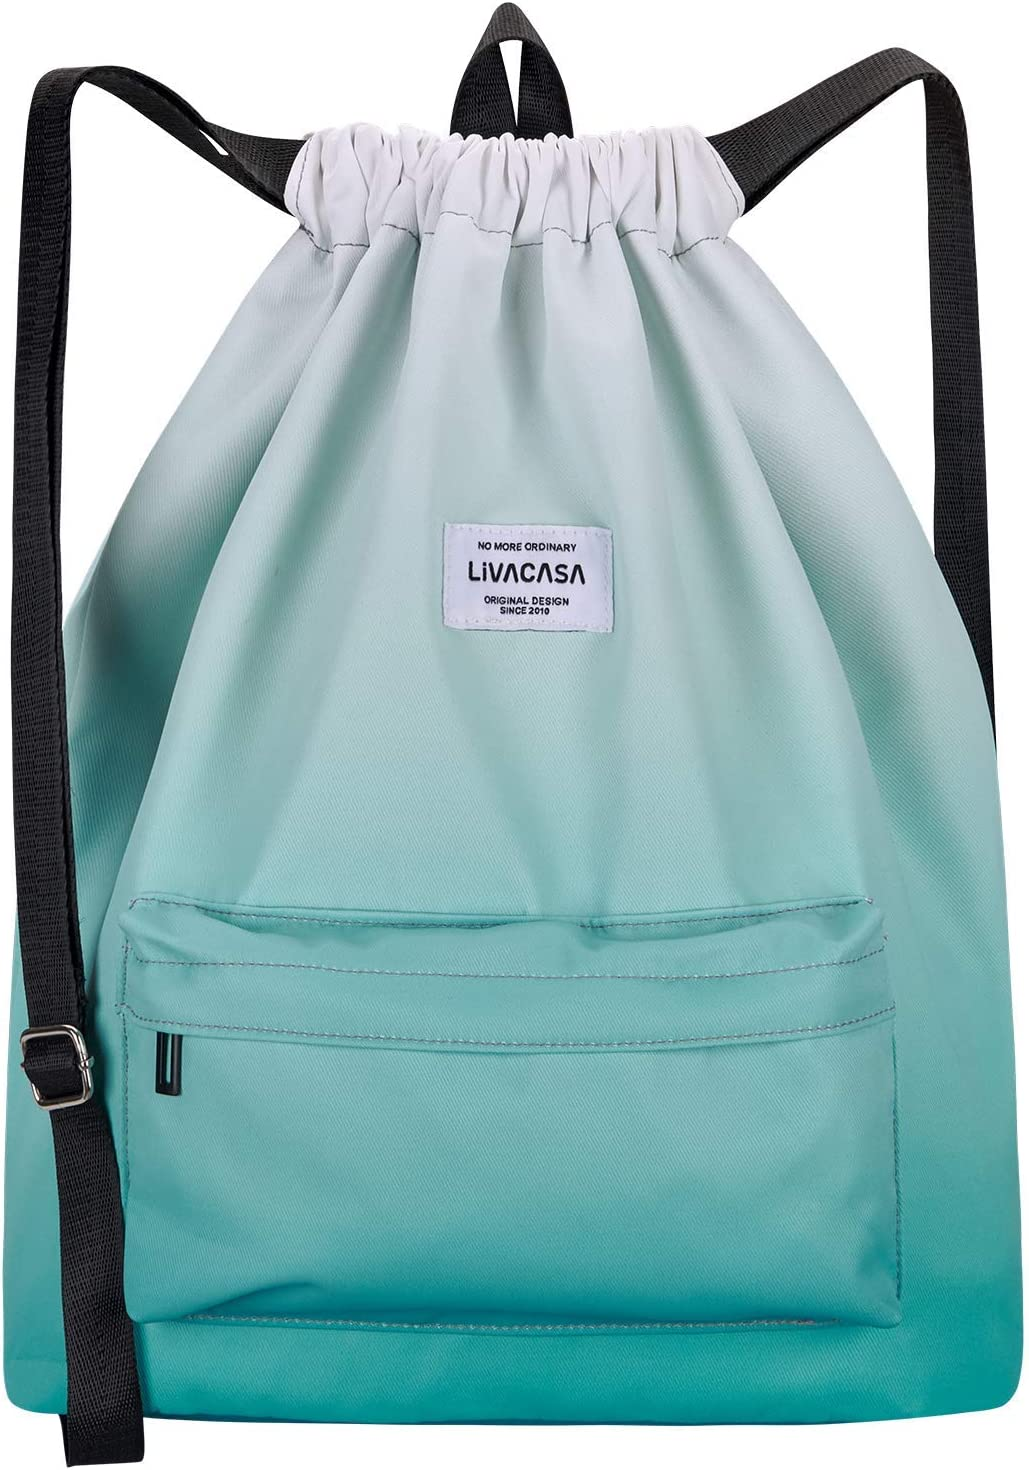 LIVACASA Drawstrings Backpacks Bags for Men Women Kids Gym Drawstrings Bag Large